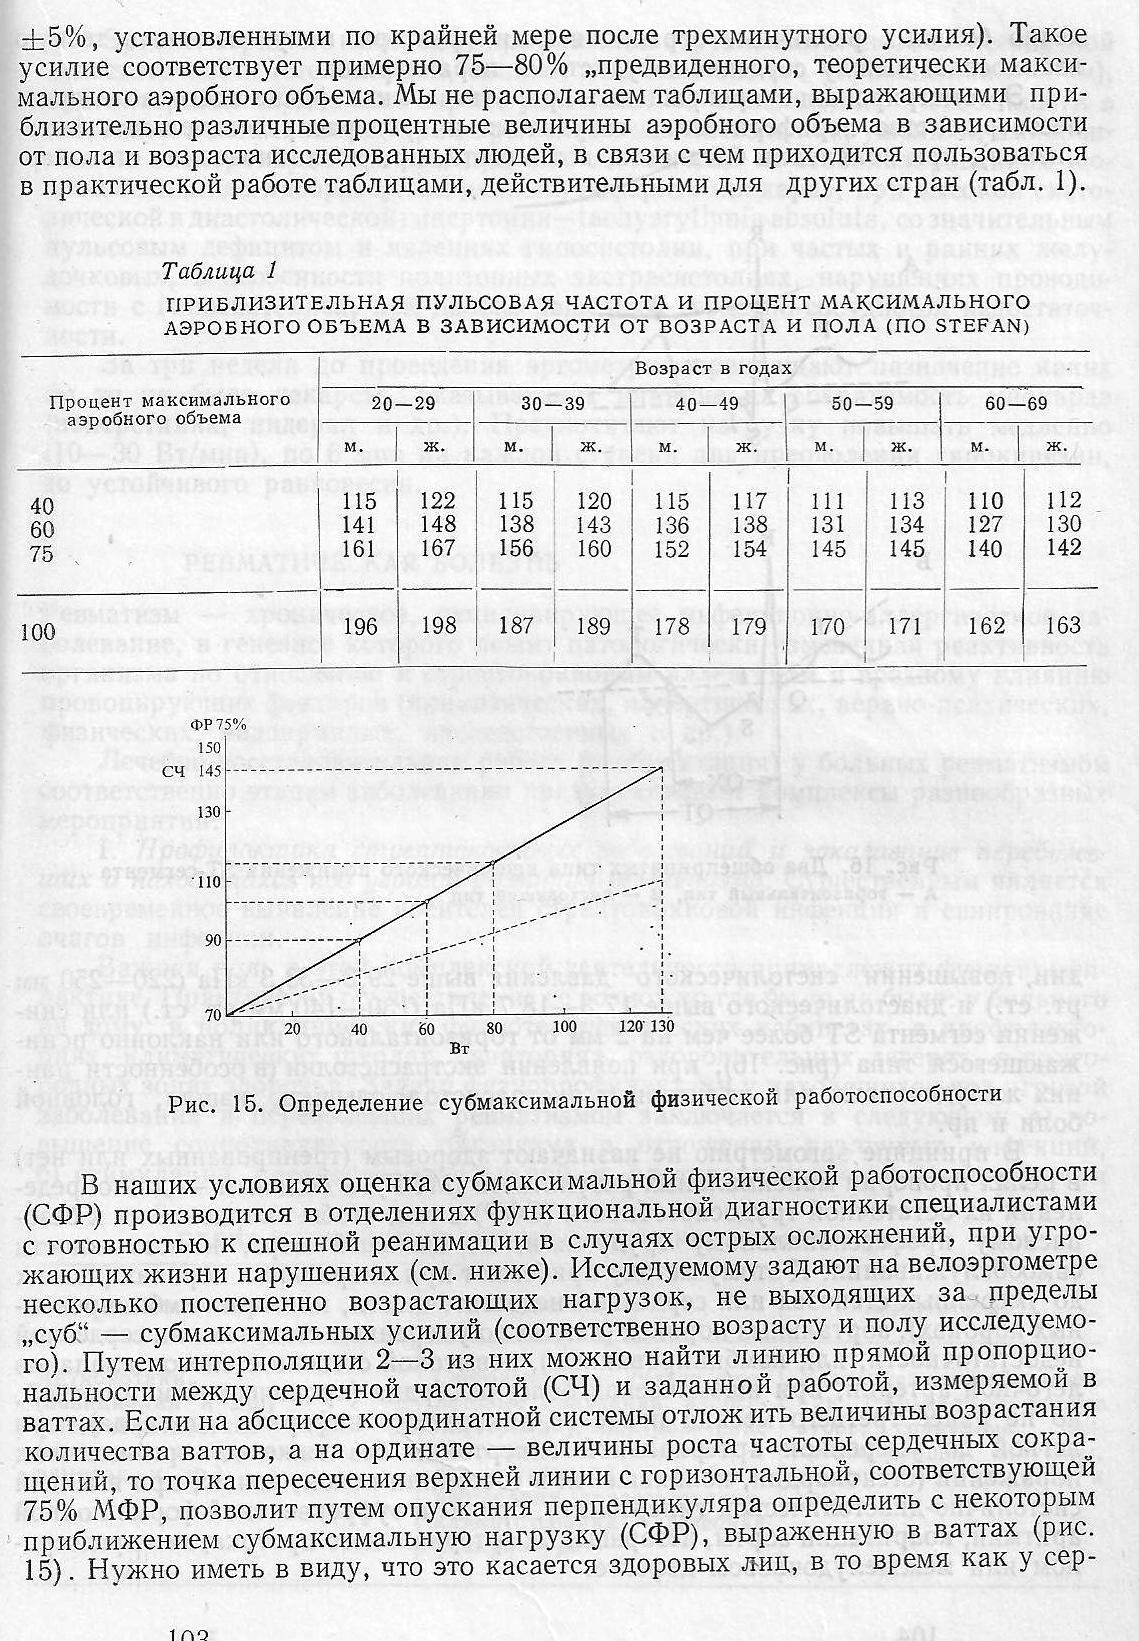 http://i4.imageban.ru/out/2017/07/12/11f19e3ad8bb264735a7730c74617ecc.jpg